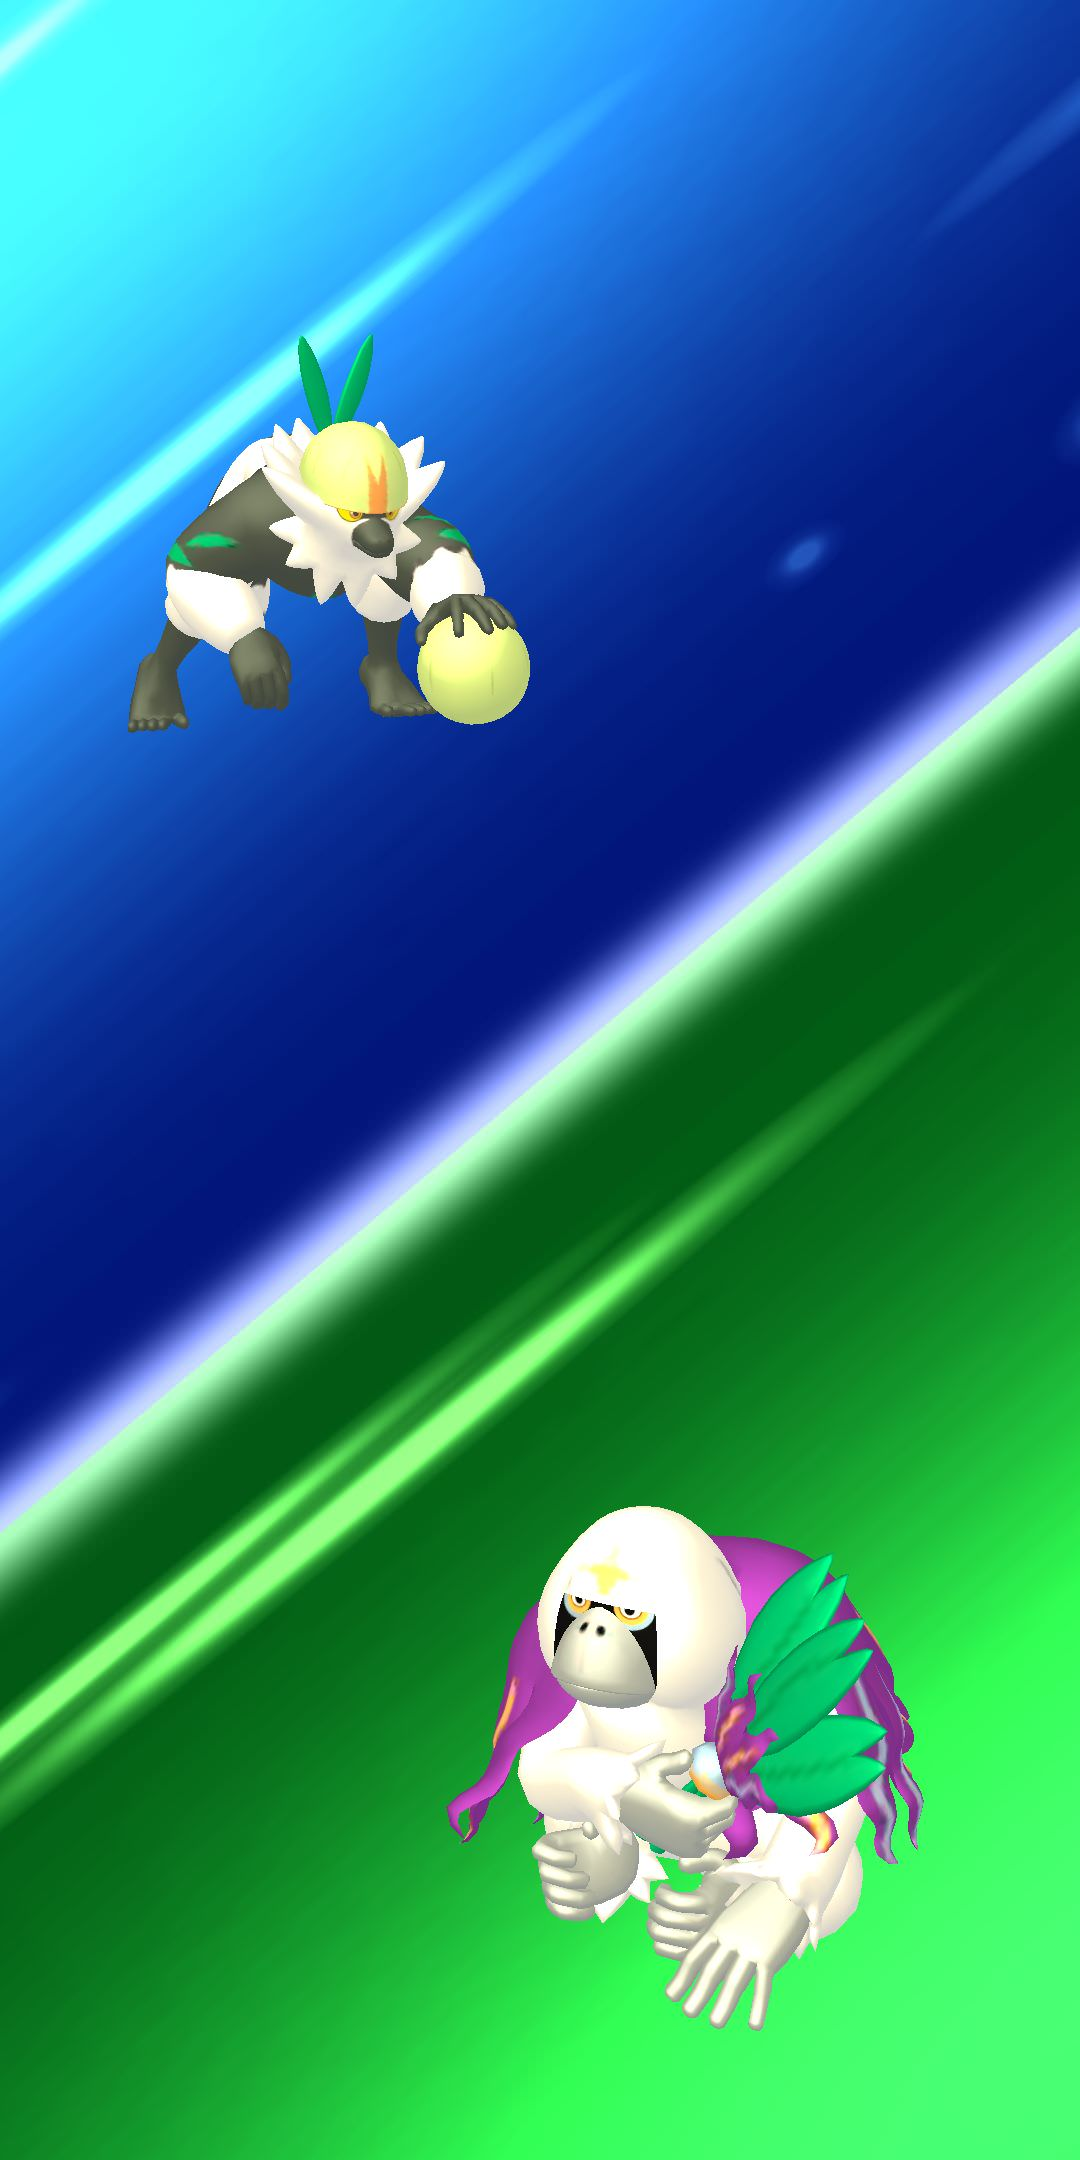 Pokemon-Home_2020_01-28-20_019